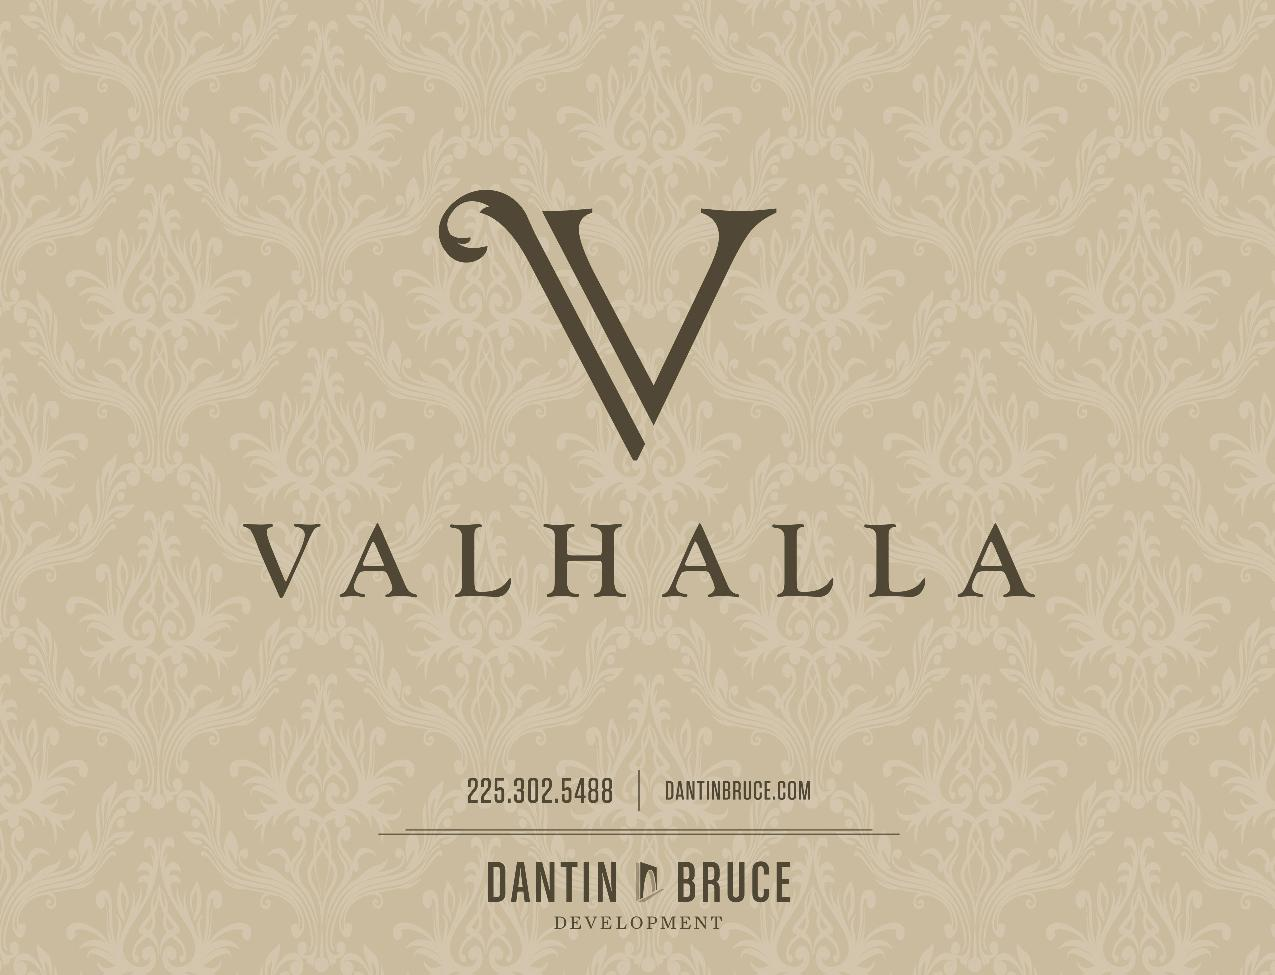 Valhalla Marketing - Digital Brochure W Price List-page-001.jpg